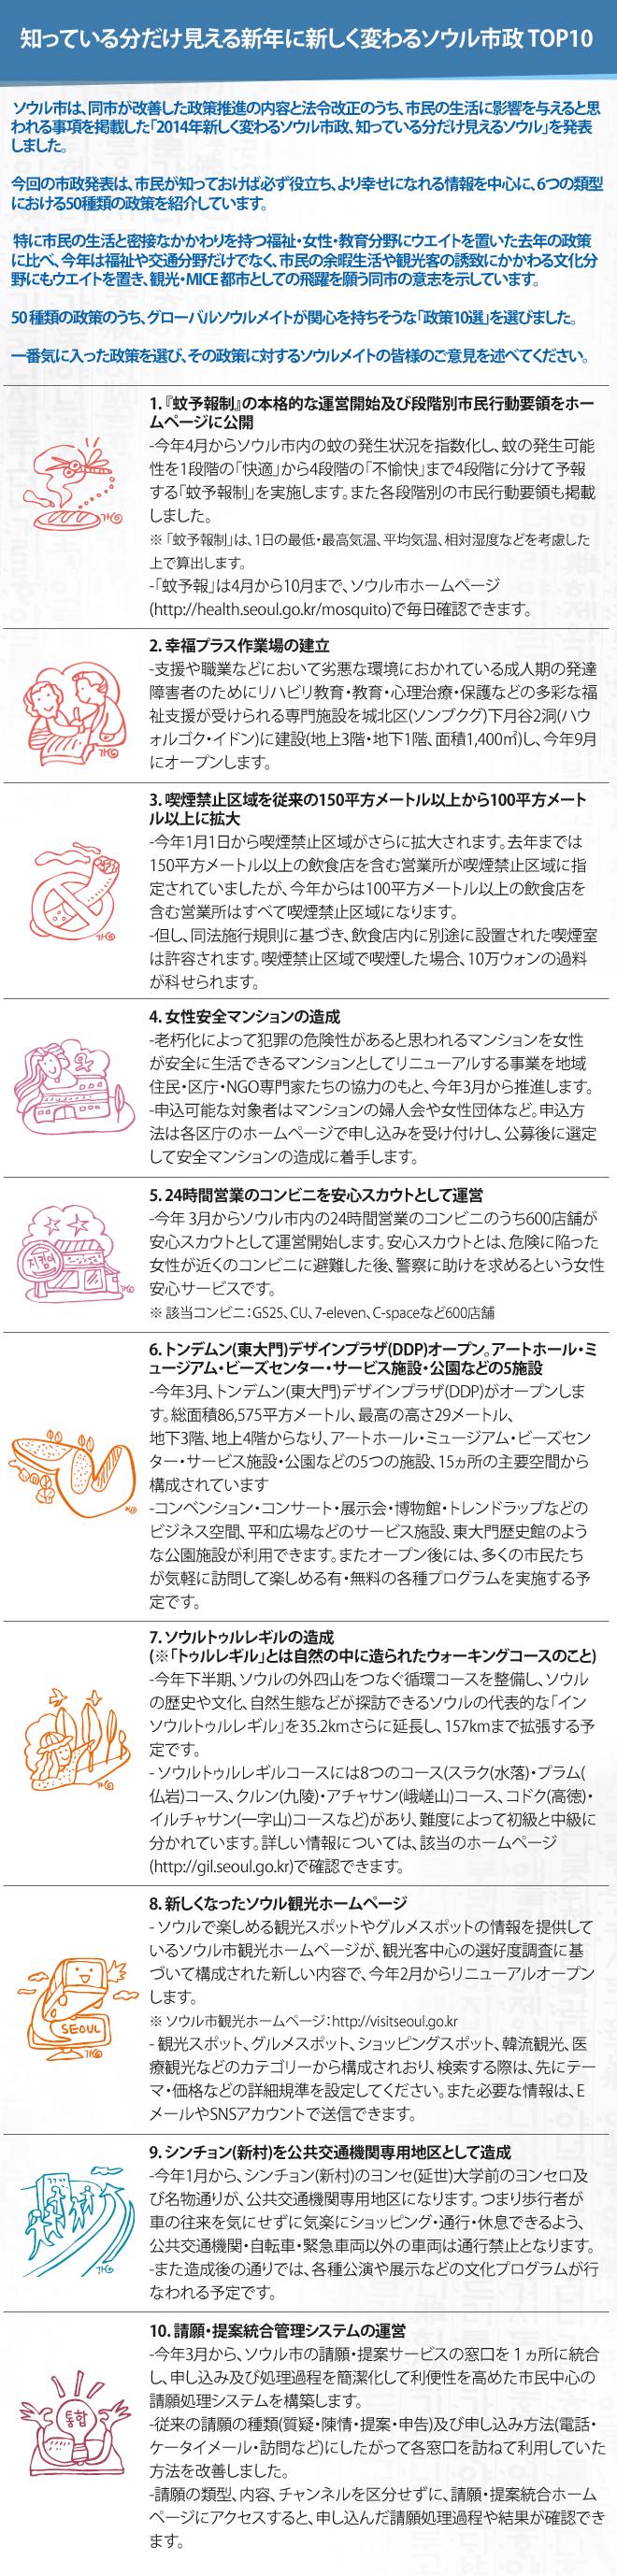 seoul_mate_detail_140114-J